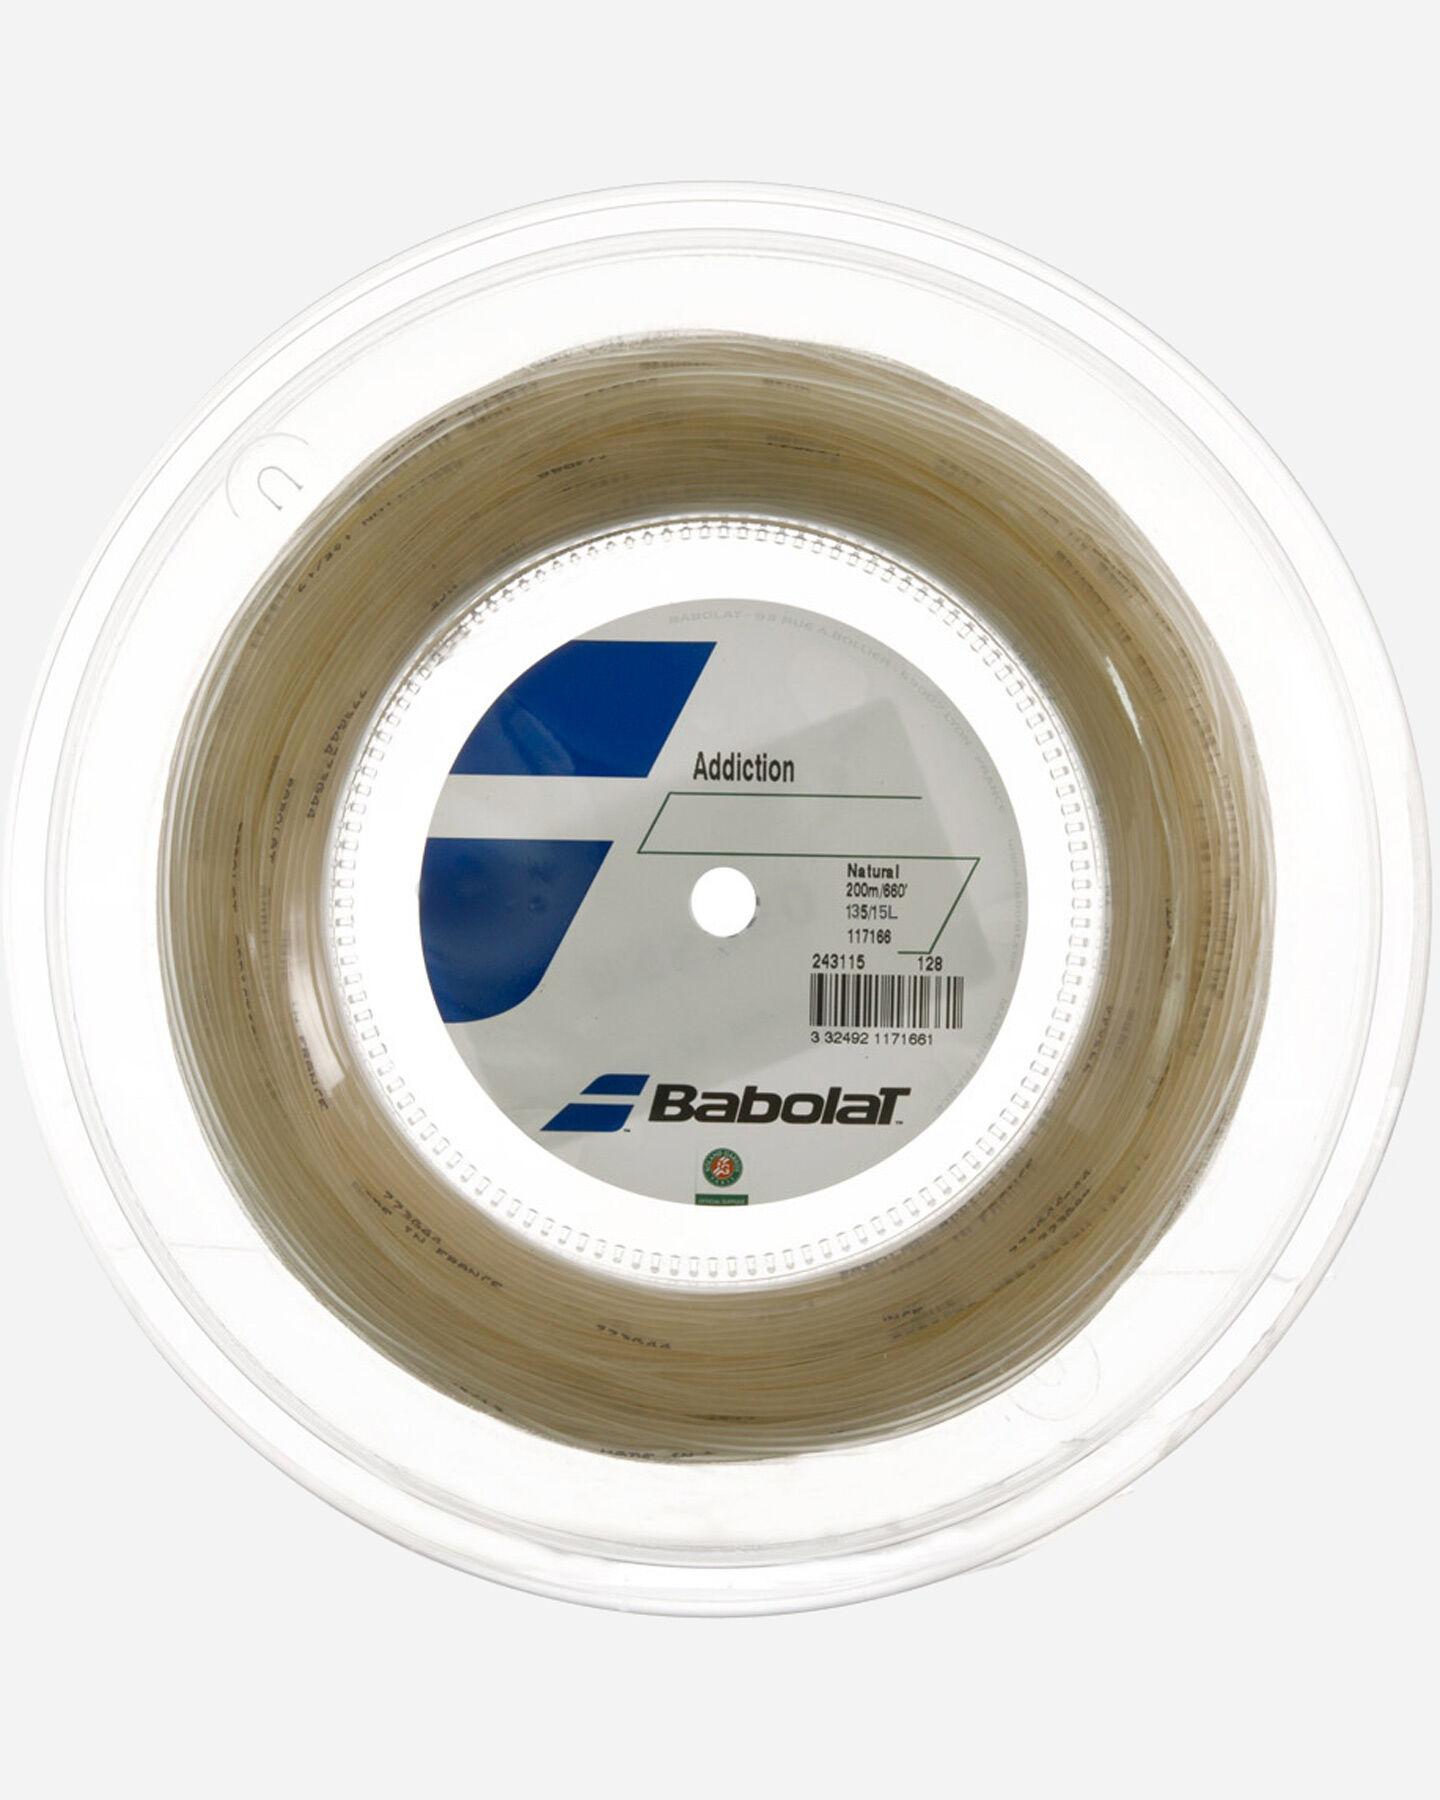 Corde tennis BABOLAT 200 MT ADDICTION NATURAL S1150751 scatto 1